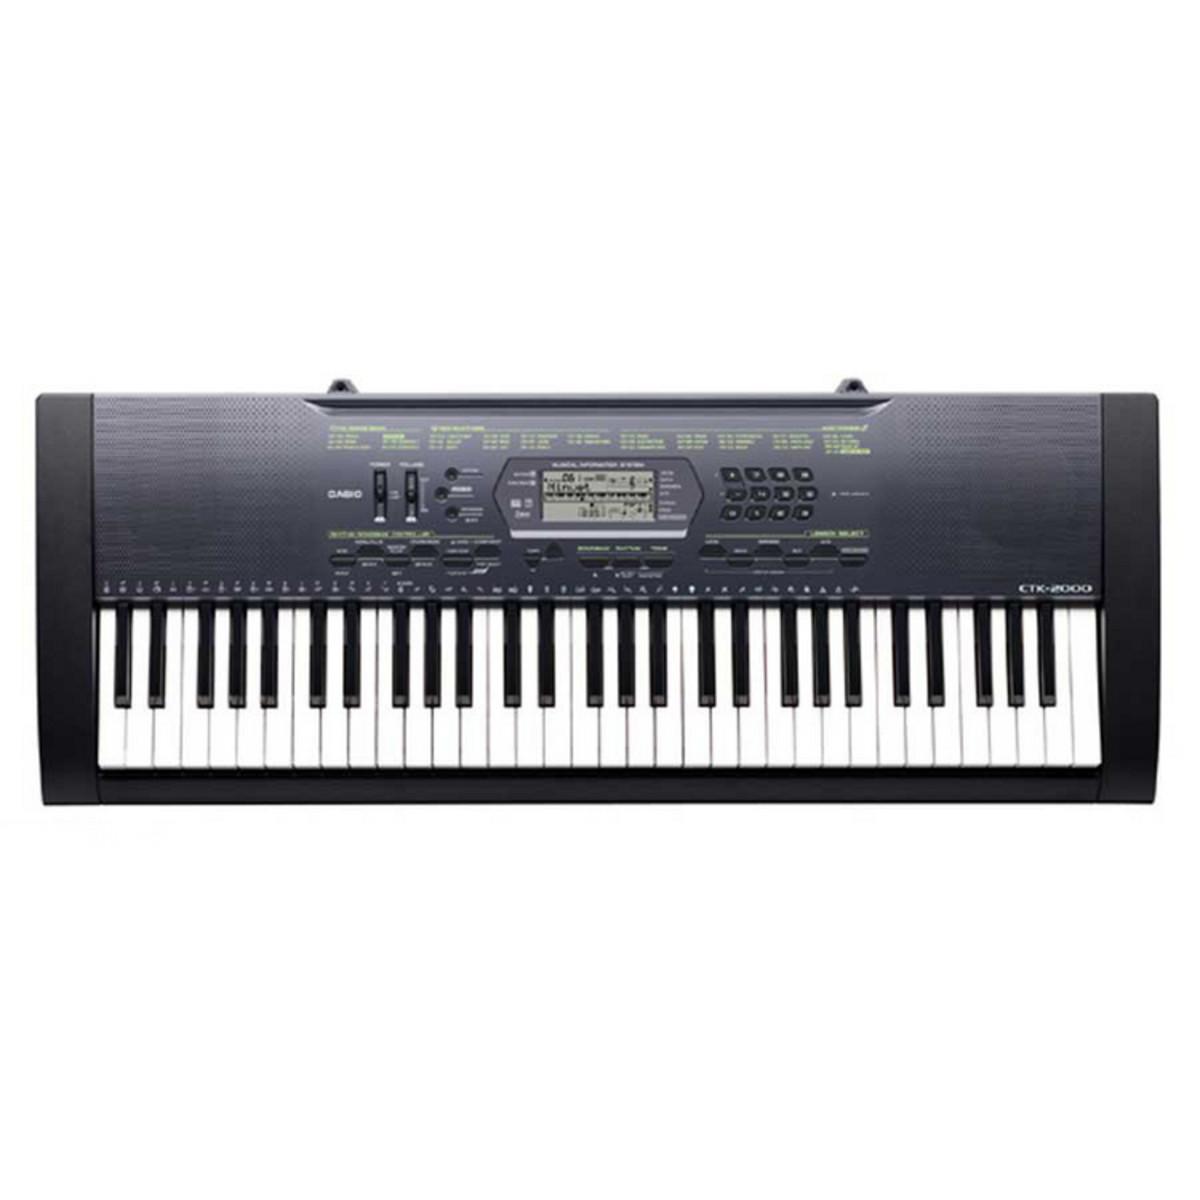 disc casio ctk 2100 keyboard at. Black Bedroom Furniture Sets. Home Design Ideas